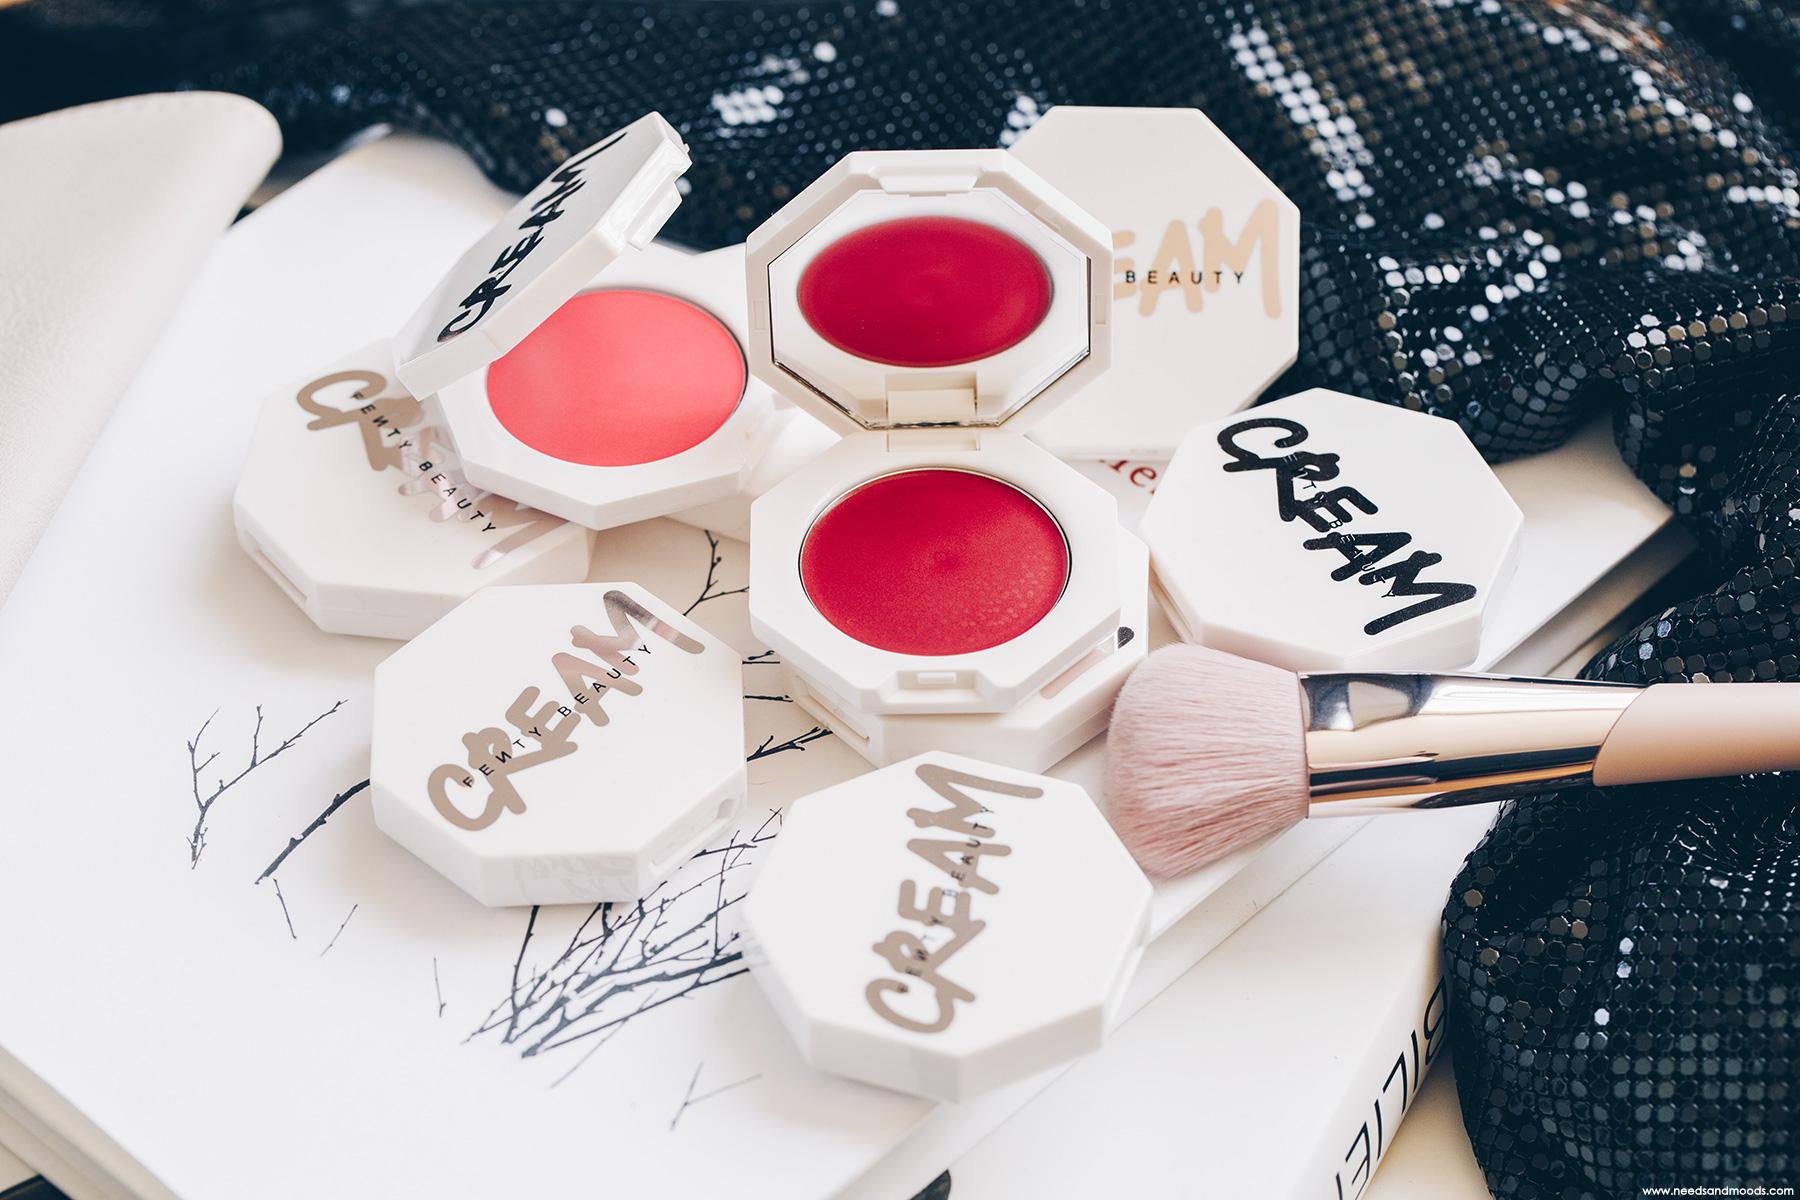 fenty beauty cheeks out freestyle cream blush strawberry drip